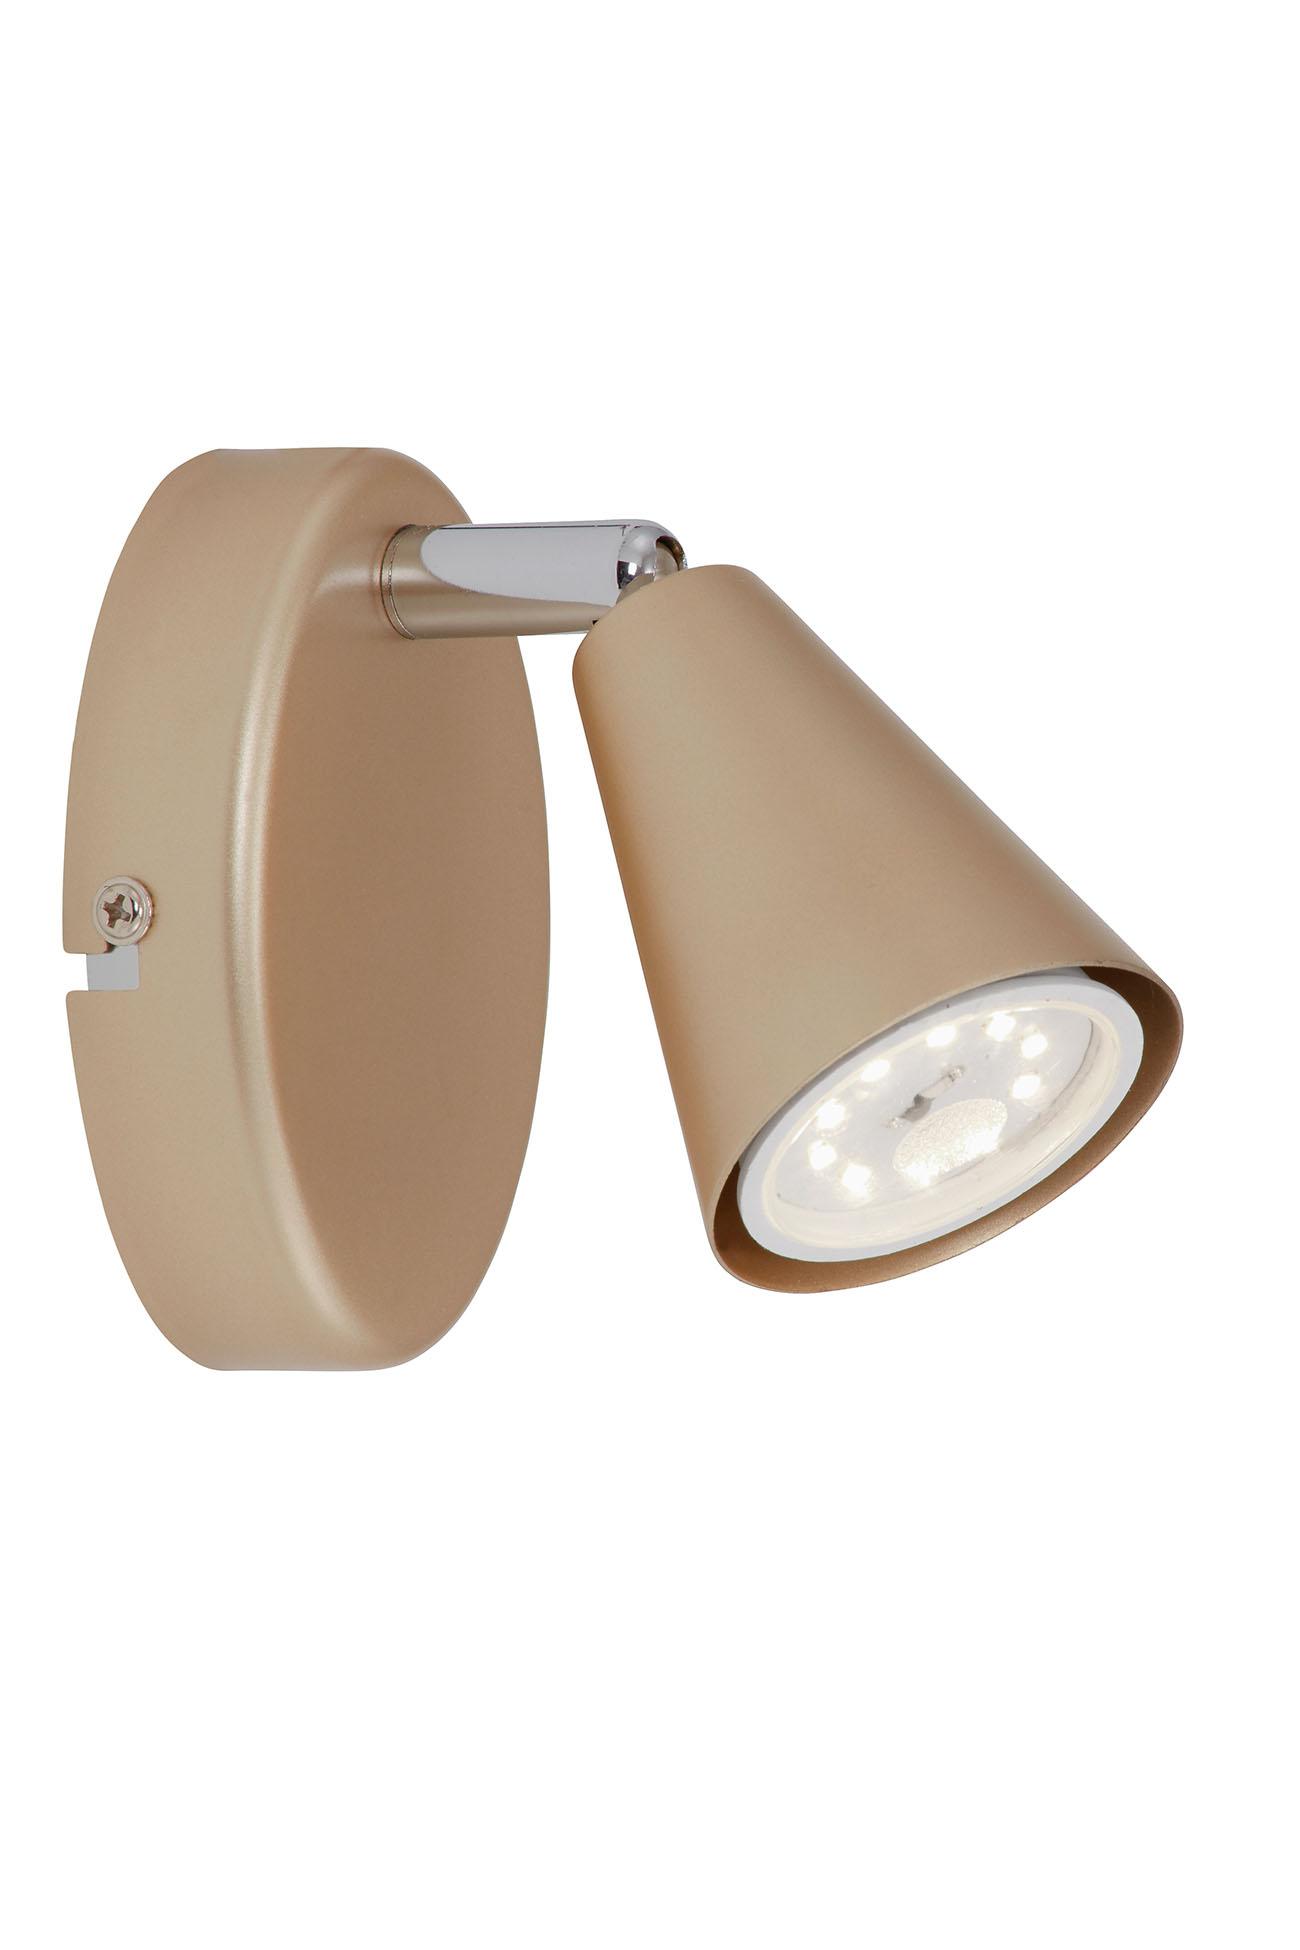 LED Spot Wandleuchte, 10,5 cm, 5 W, Gold